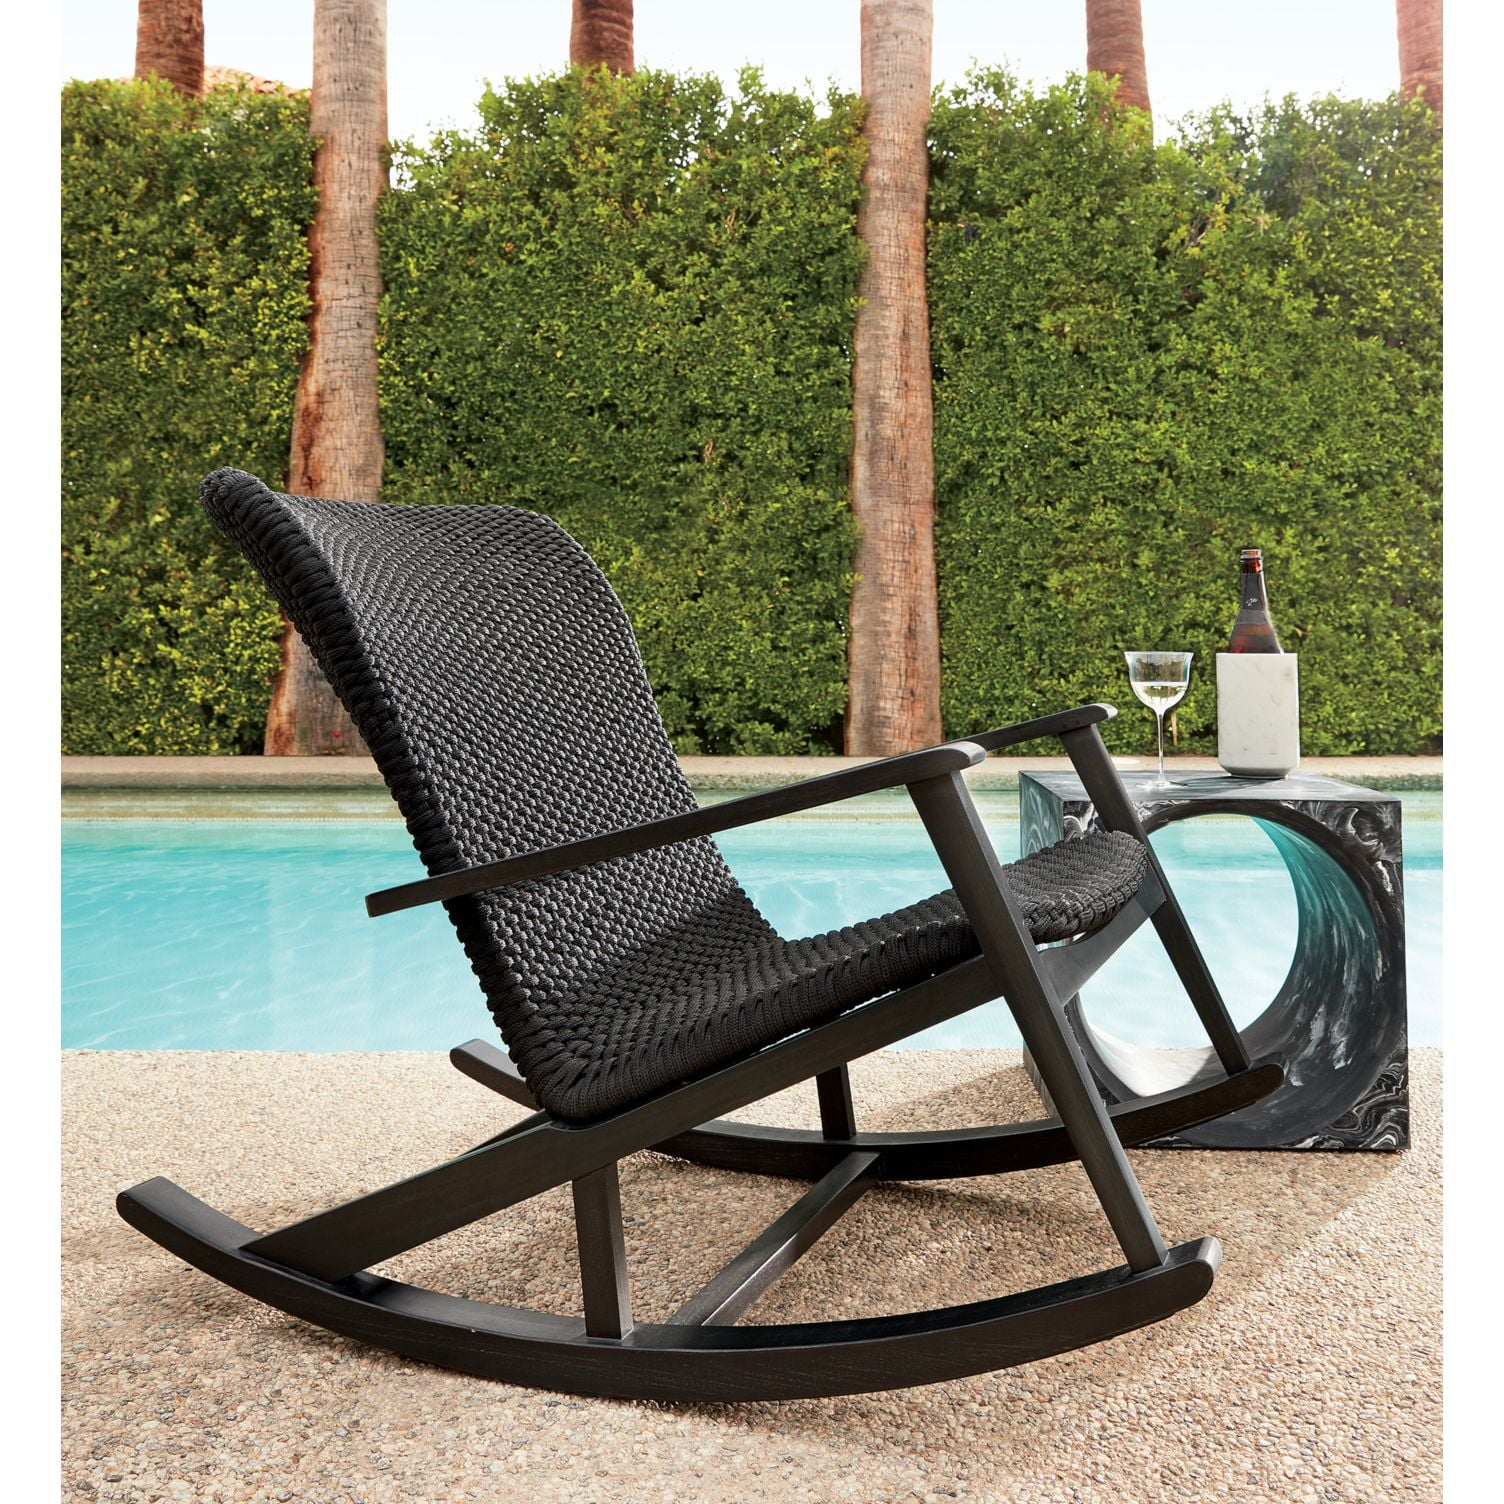 Viareggio Outdoor Rocking Chair  Give Your Backyard a Midcentury